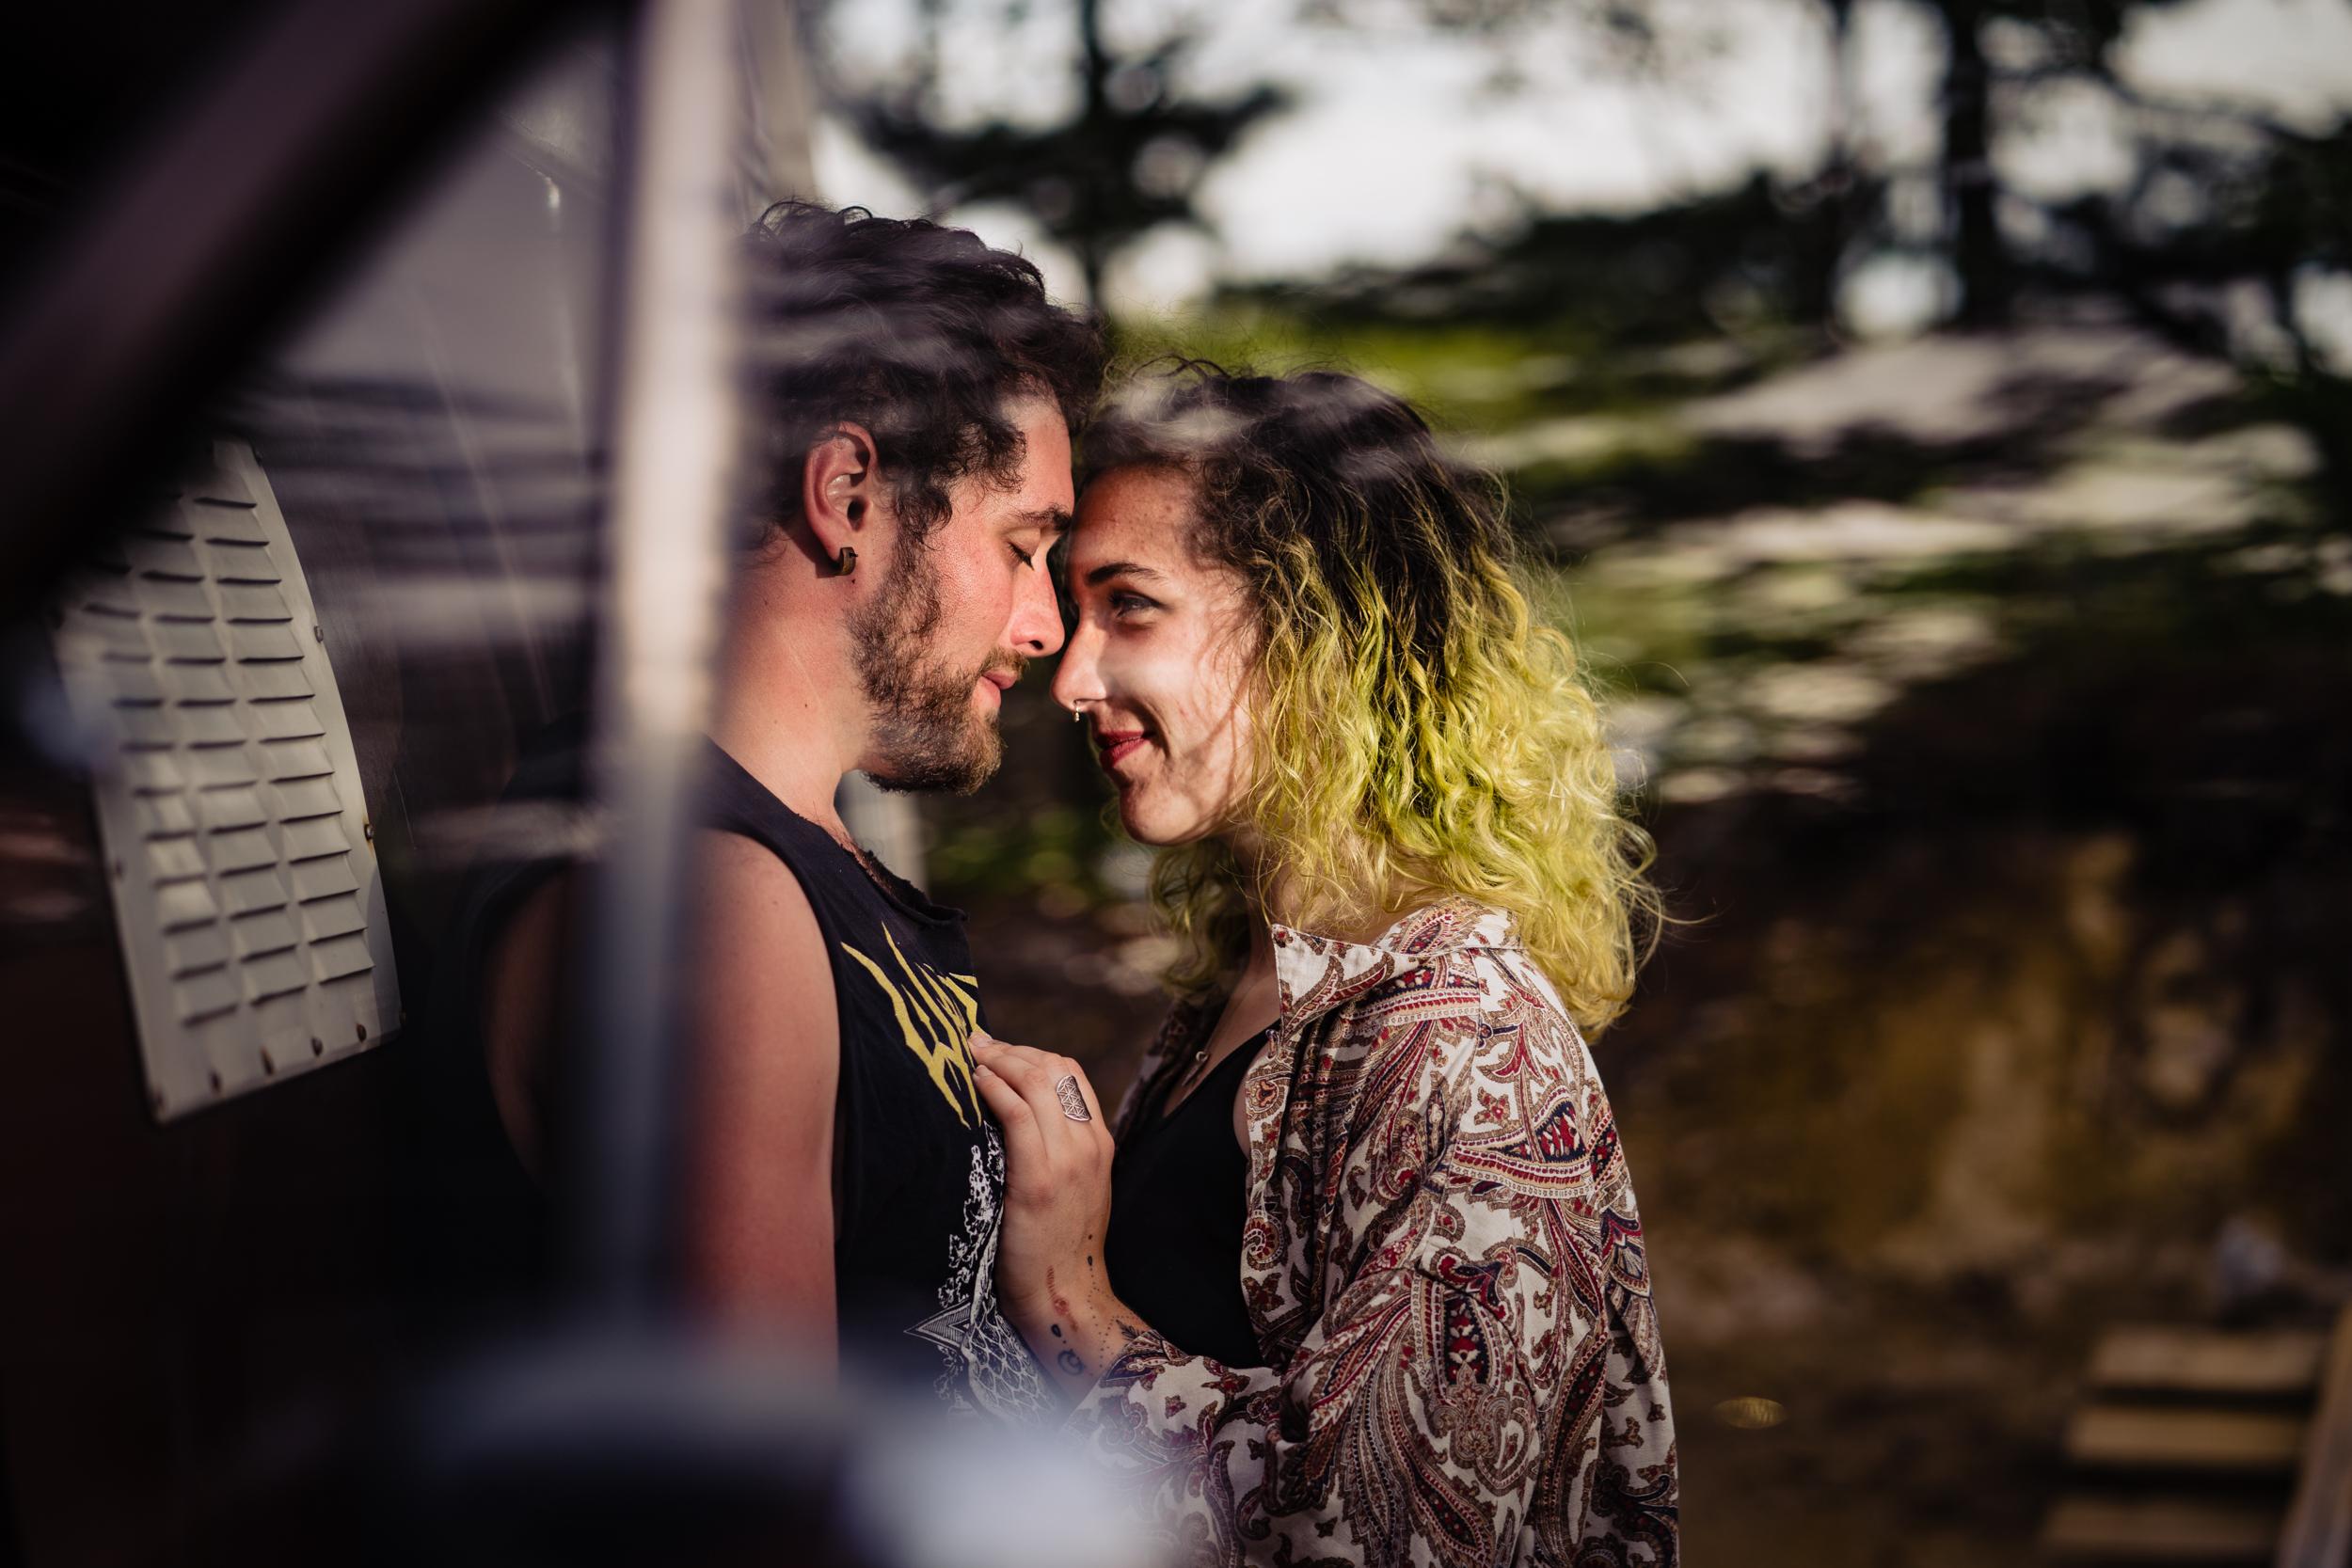 Halifax_couplessession_engagement_weddings_novascotia_foxandfellow_Geena&Jamie-93.jpg